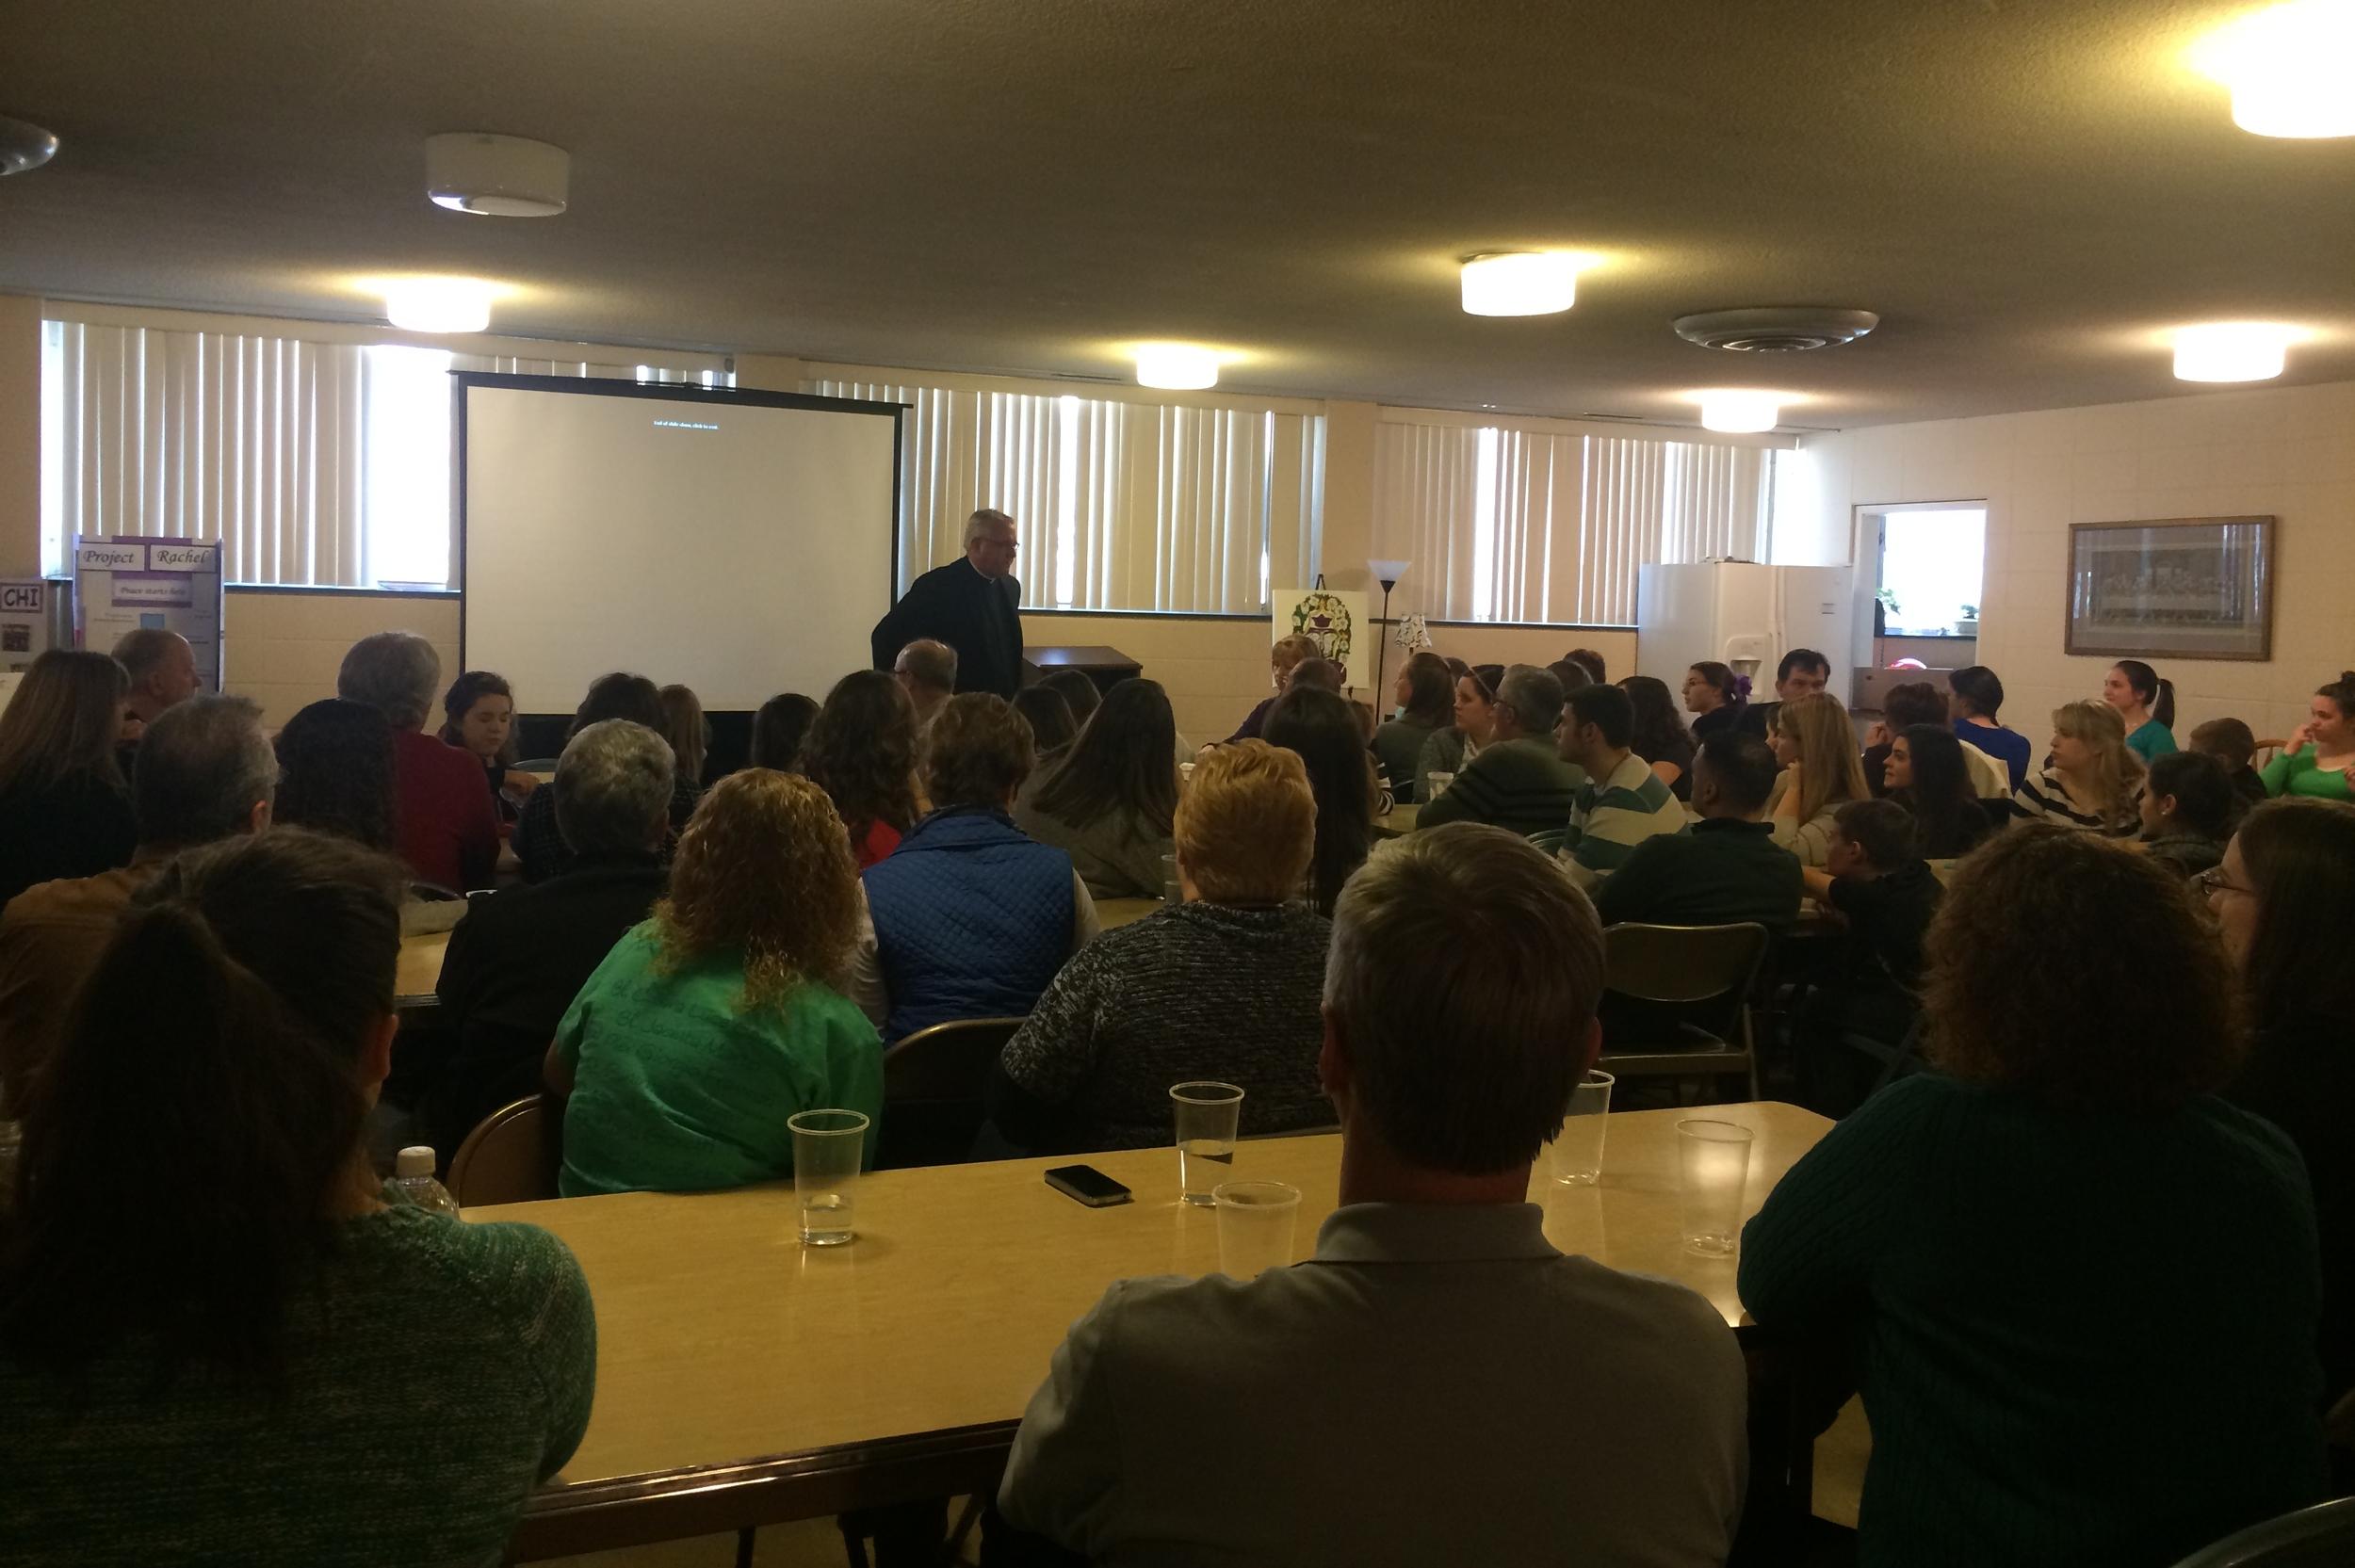 Fr. Robert Matya addressing the sorority members and families at the potluck.